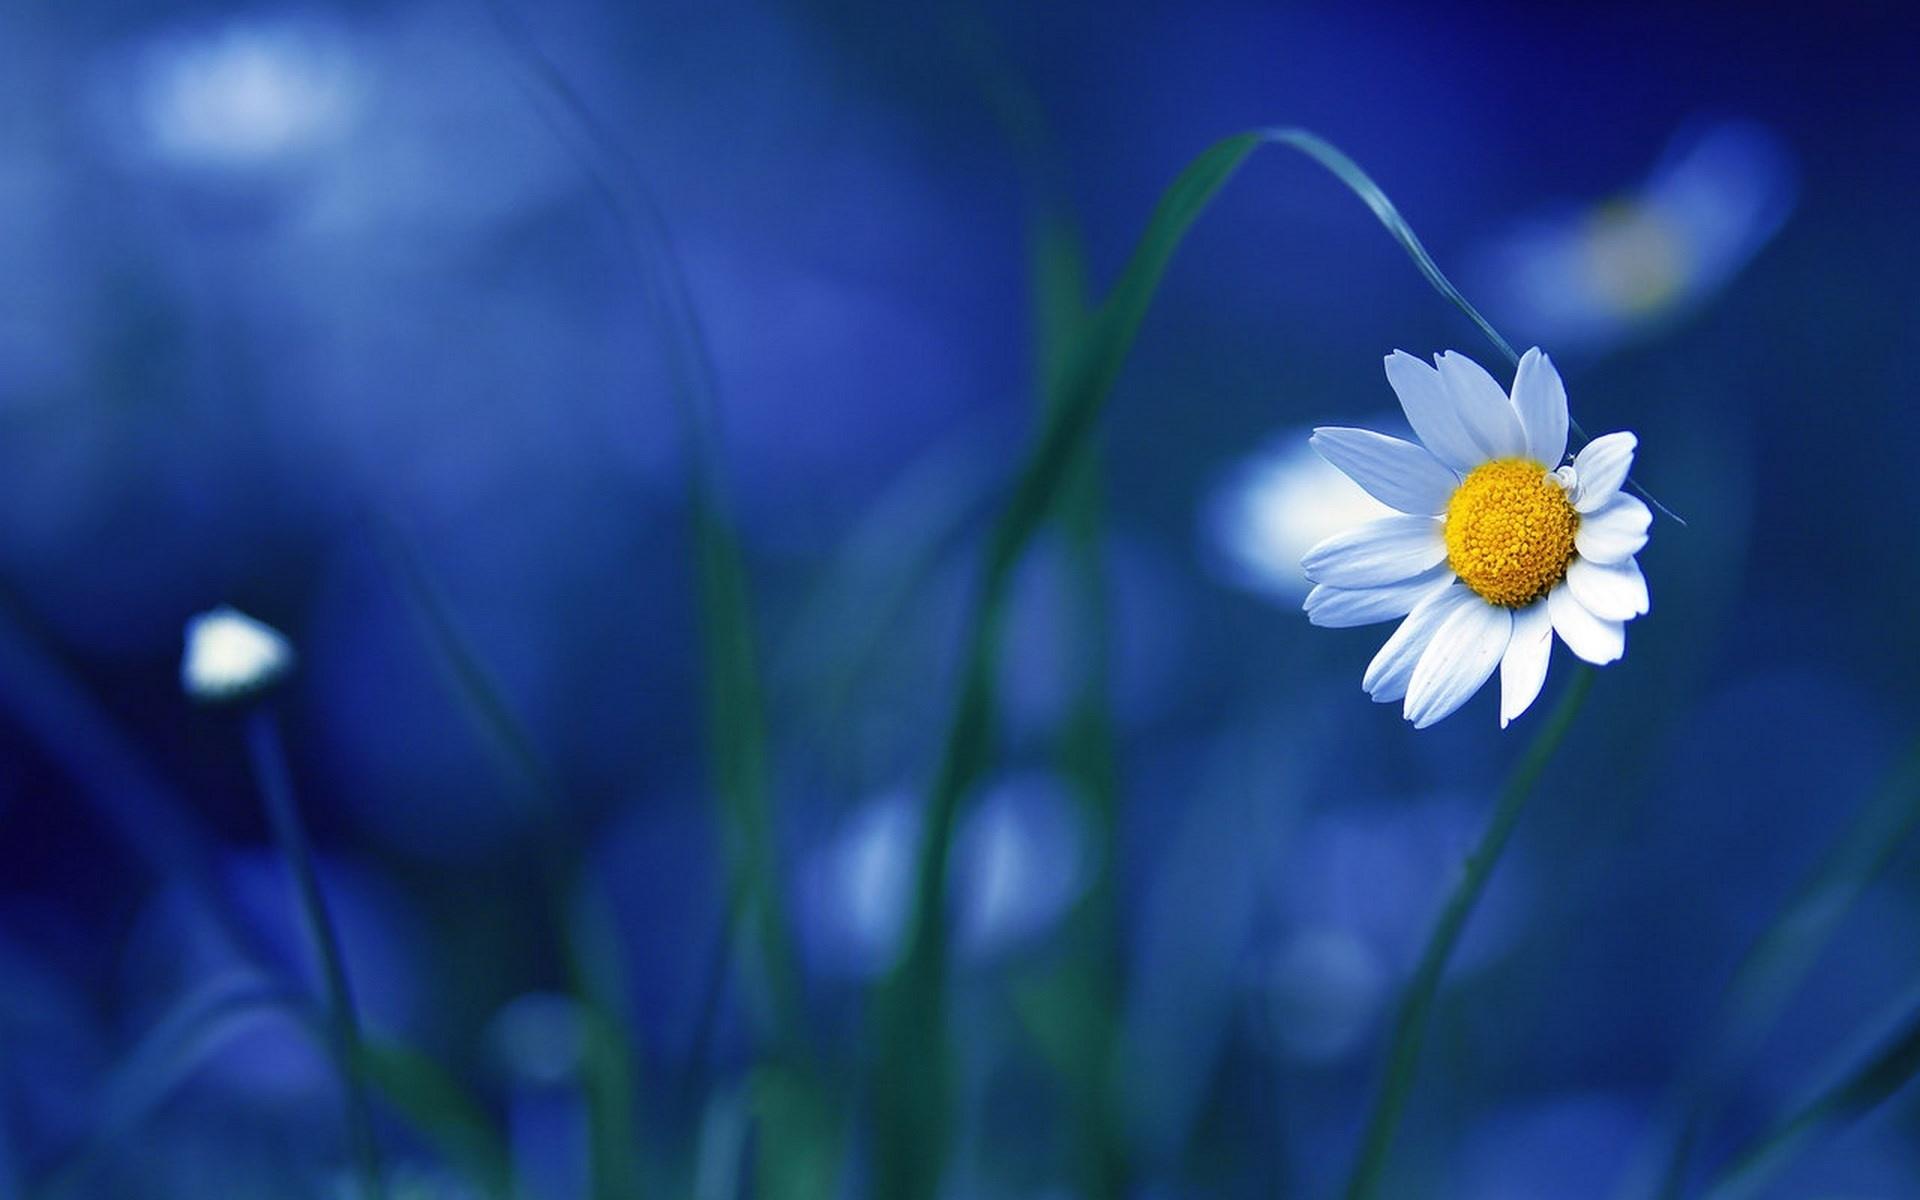 flower_chamomile_macro_1920x1200.jpg